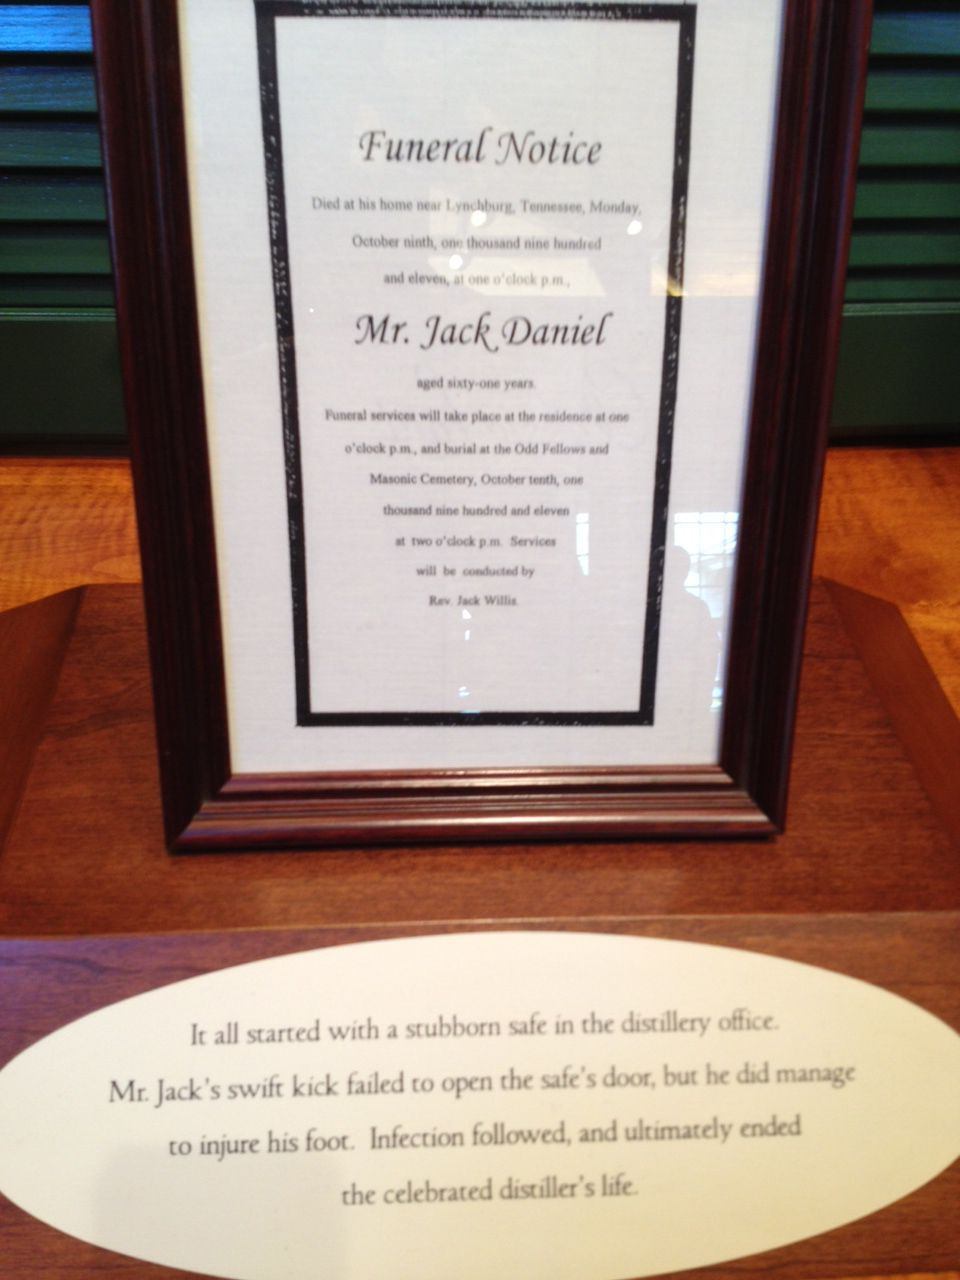 Jack Daniels died of Diabetic foot infection